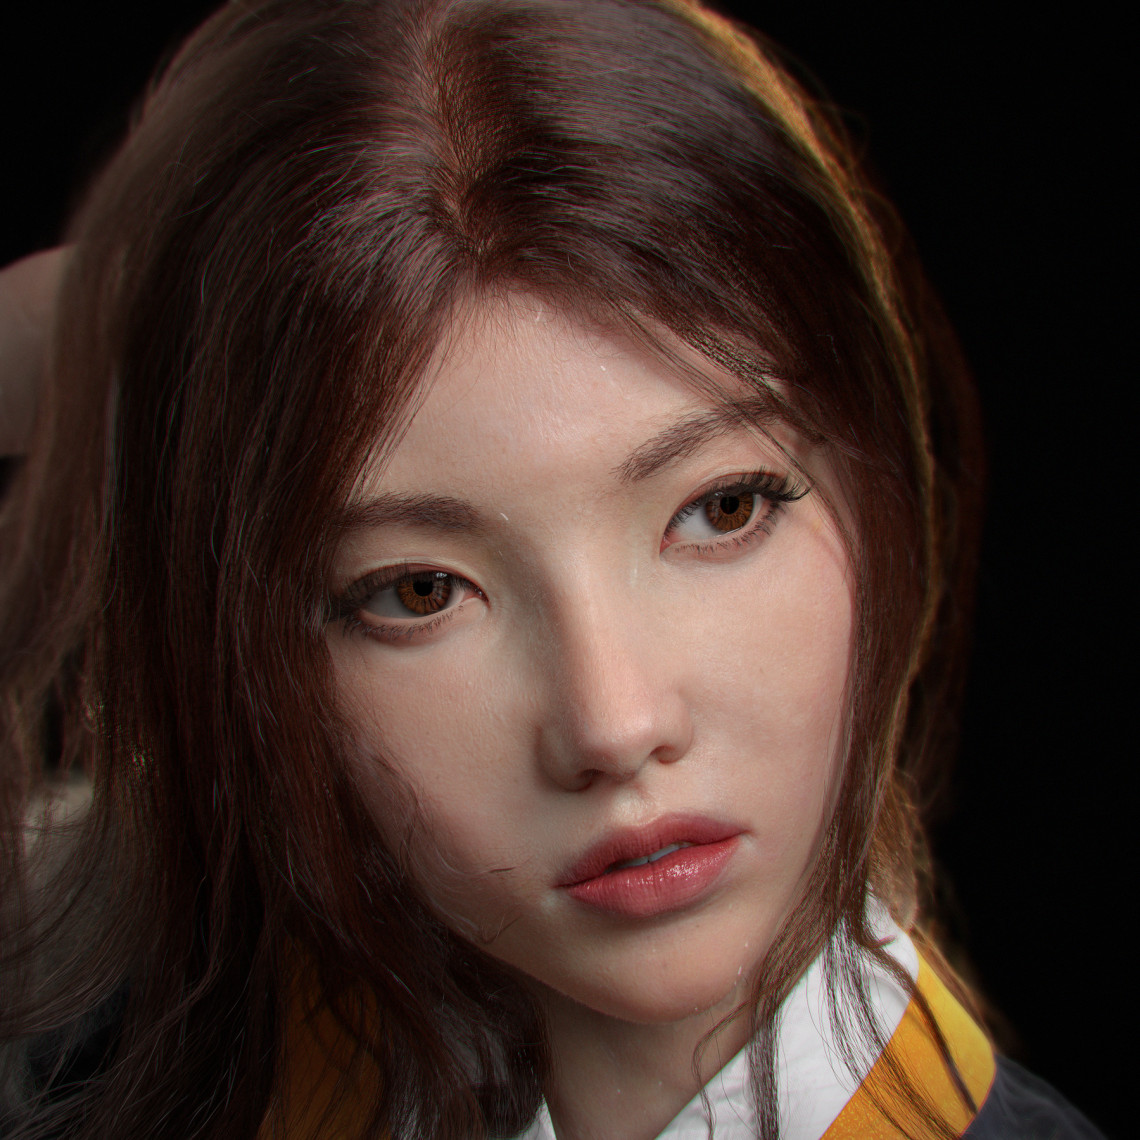 Korean soldier韩国武士女性角色设计作品    设计师:vahidahmadi3d